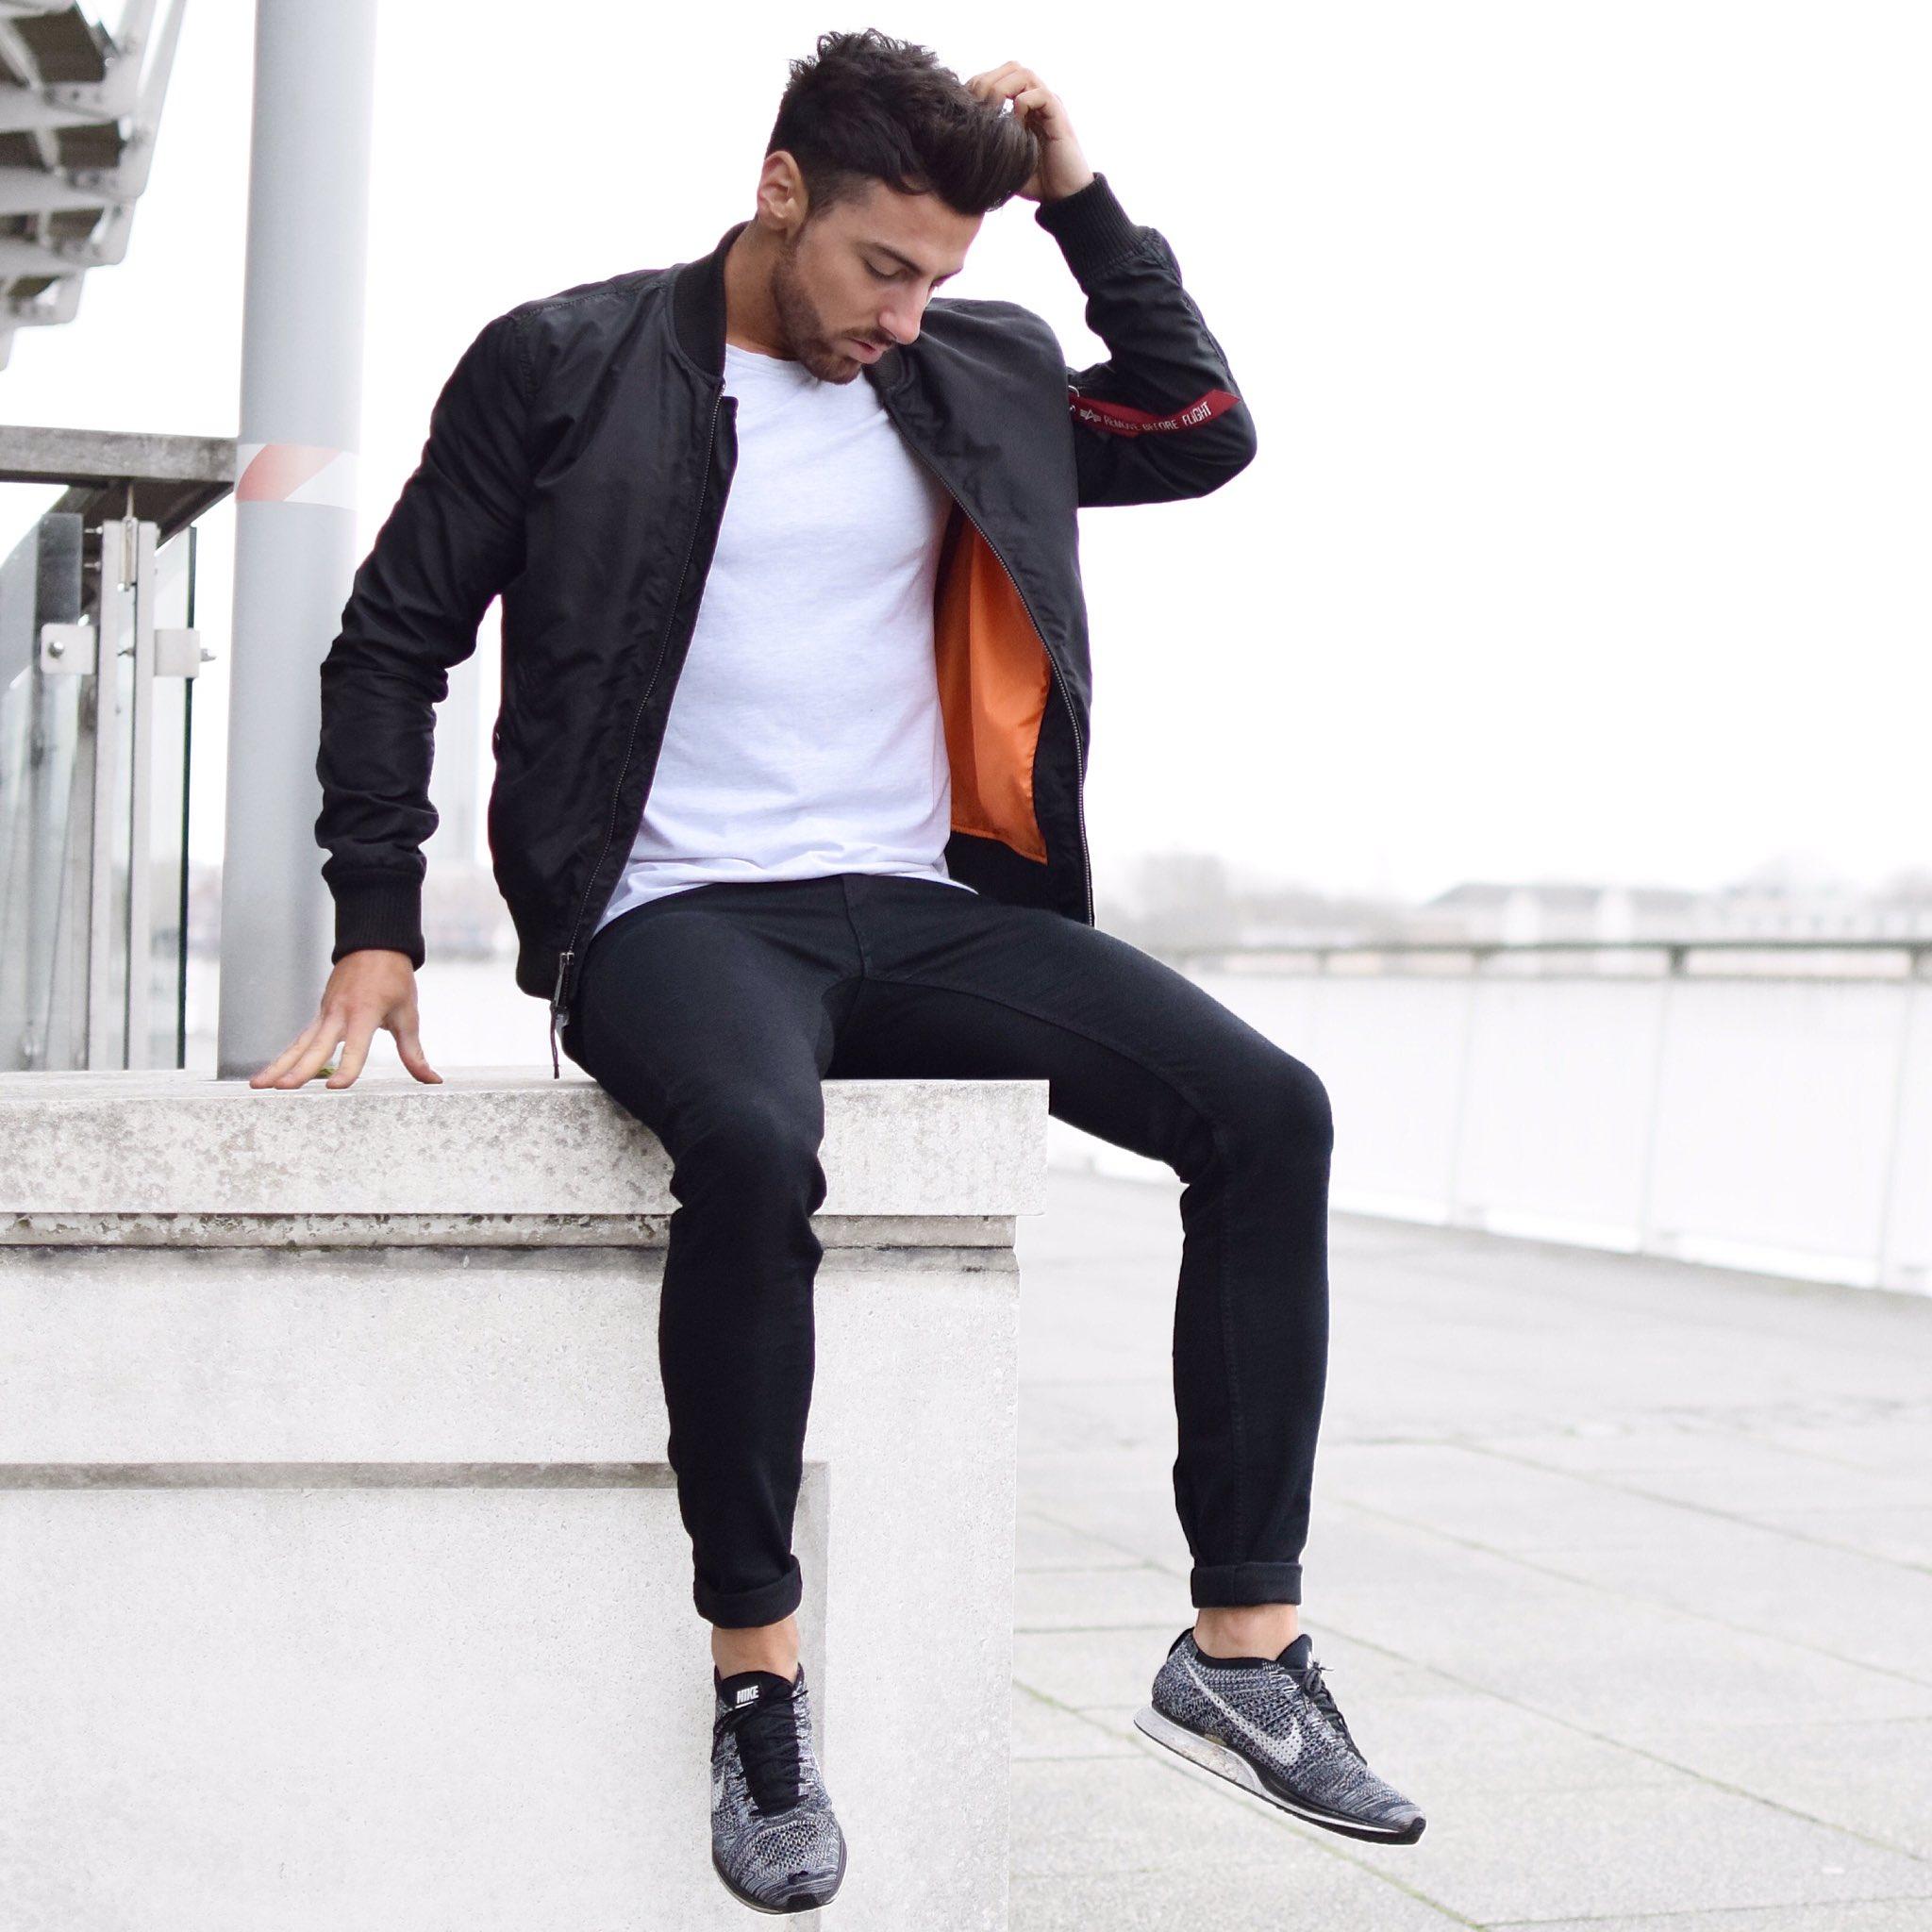 rowan row on twitter remove before flight bomber jacket rowanrow fashionista fashion. Black Bedroom Furniture Sets. Home Design Ideas